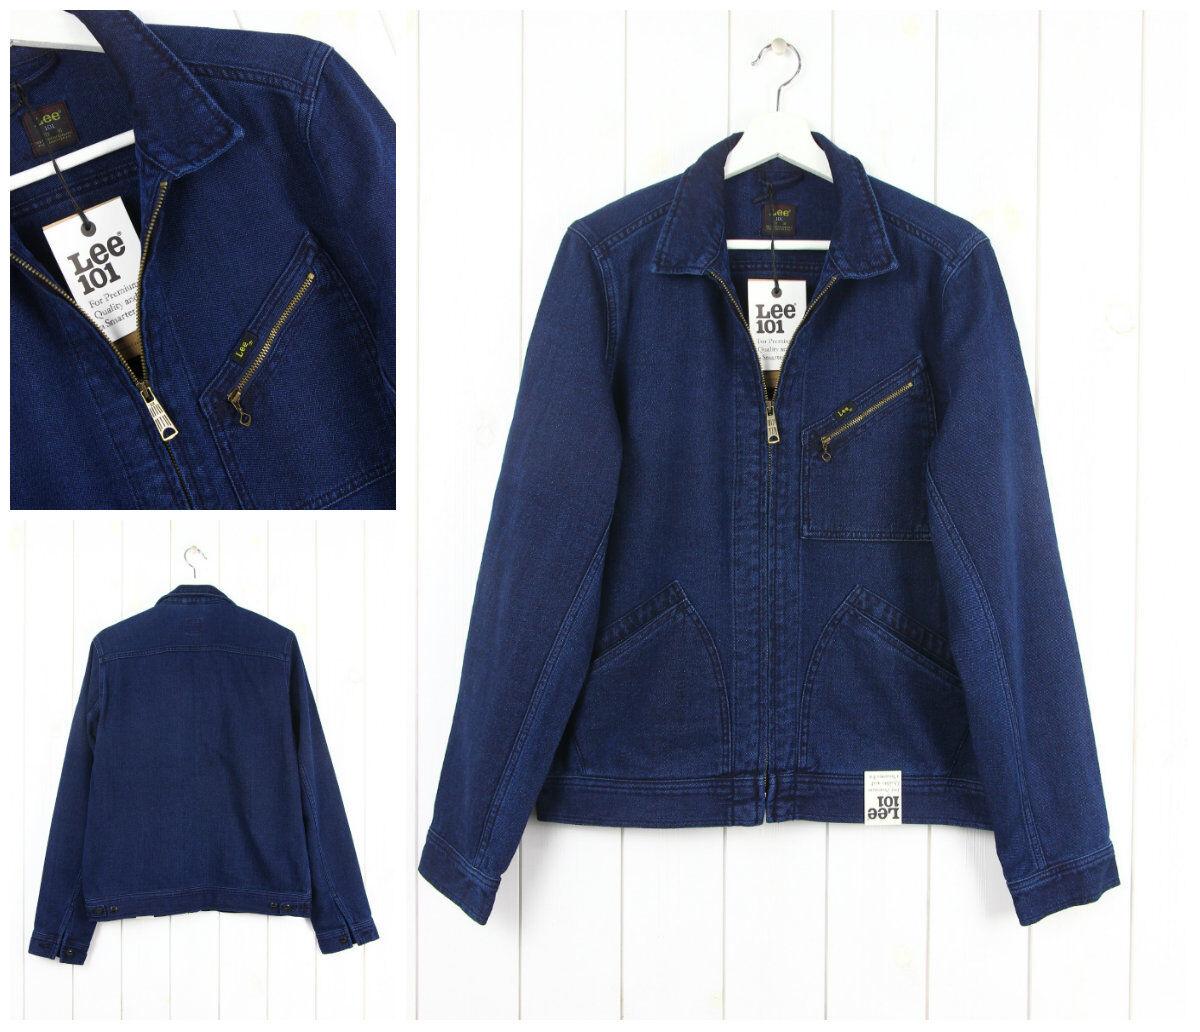 NUOVO Lee 101 Giacca con zip Indaco tela denim regular blue scuro _ S M L XL